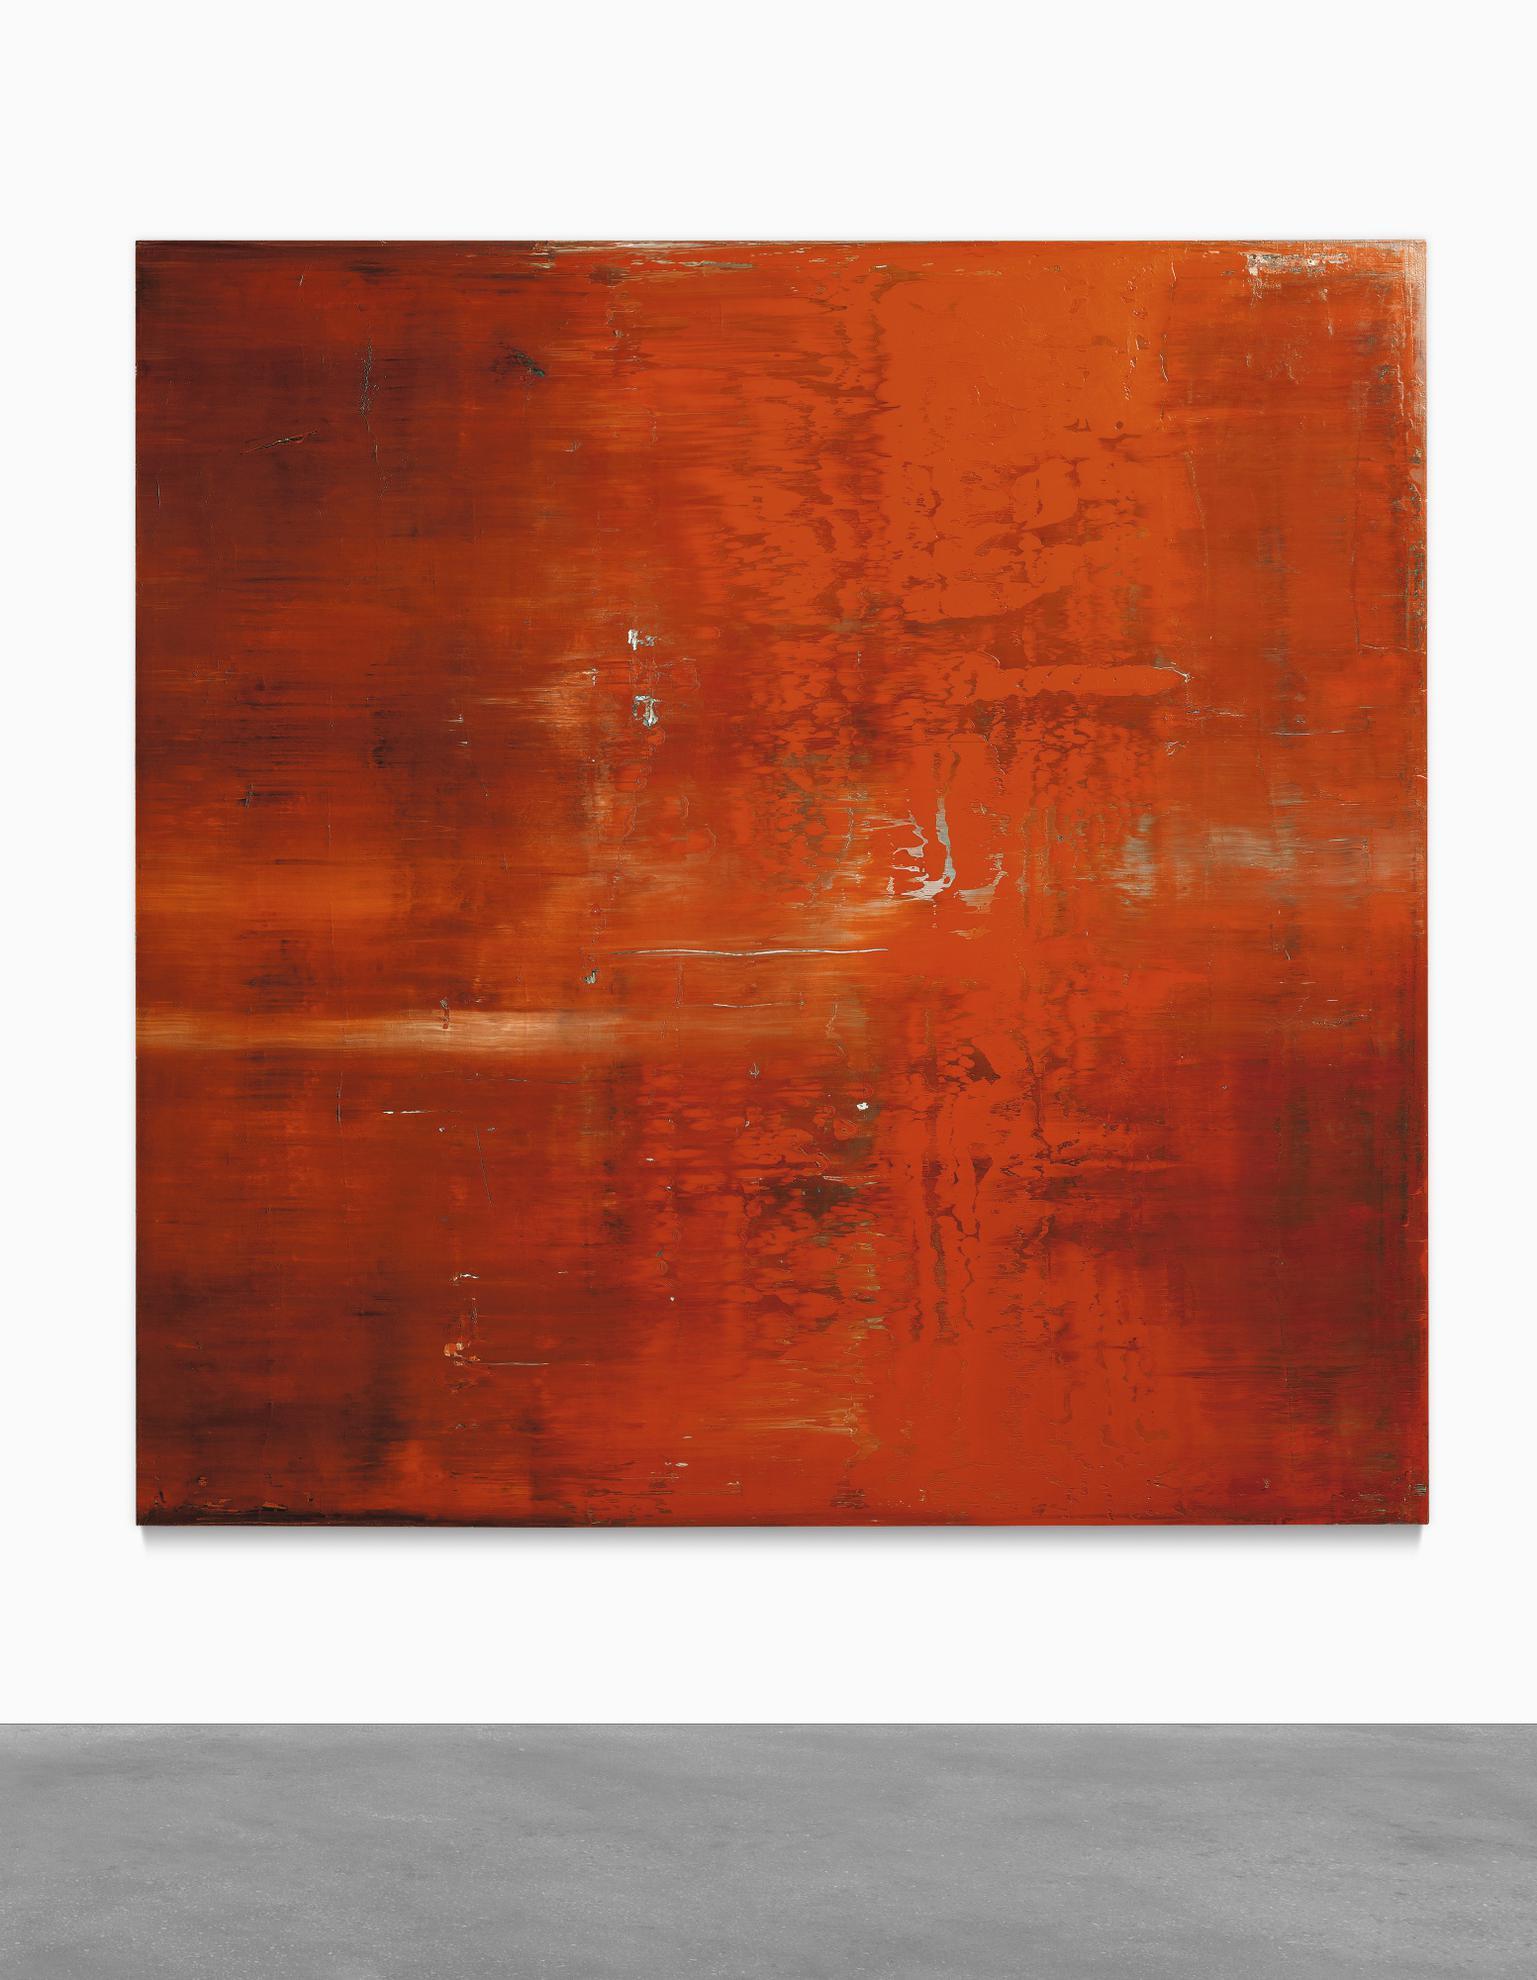 Gerhard Richter-Abstraktes Bild-1991